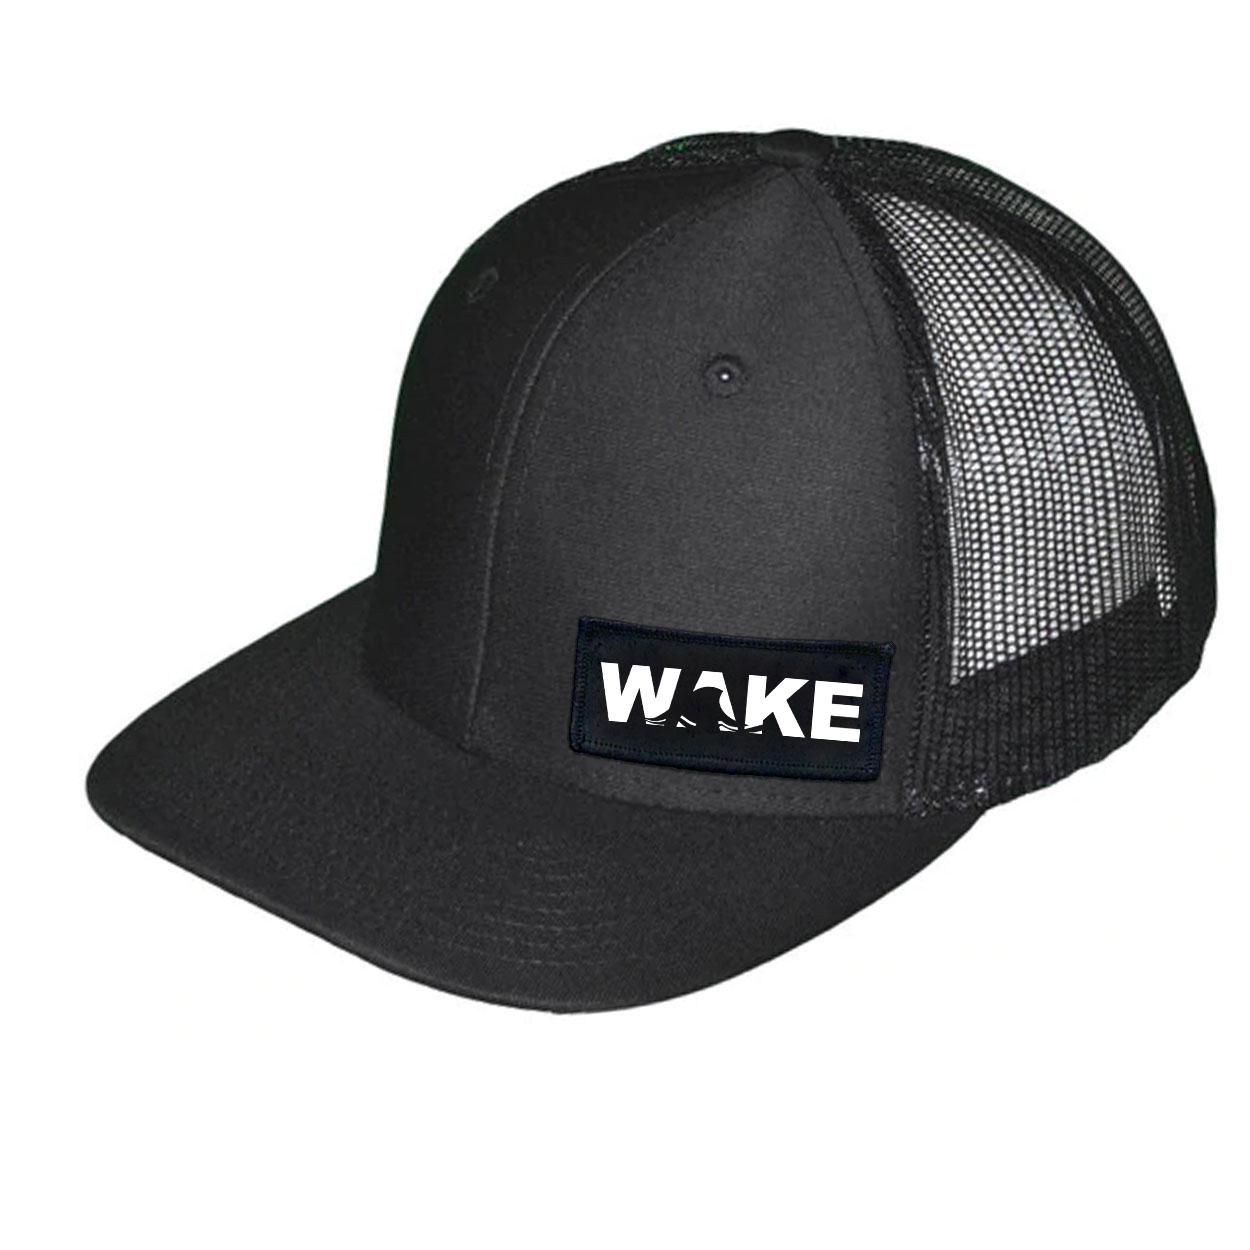 Wake Wave Logo Night Out Woven Patch Snapback Trucker Hat Black (White Logo)